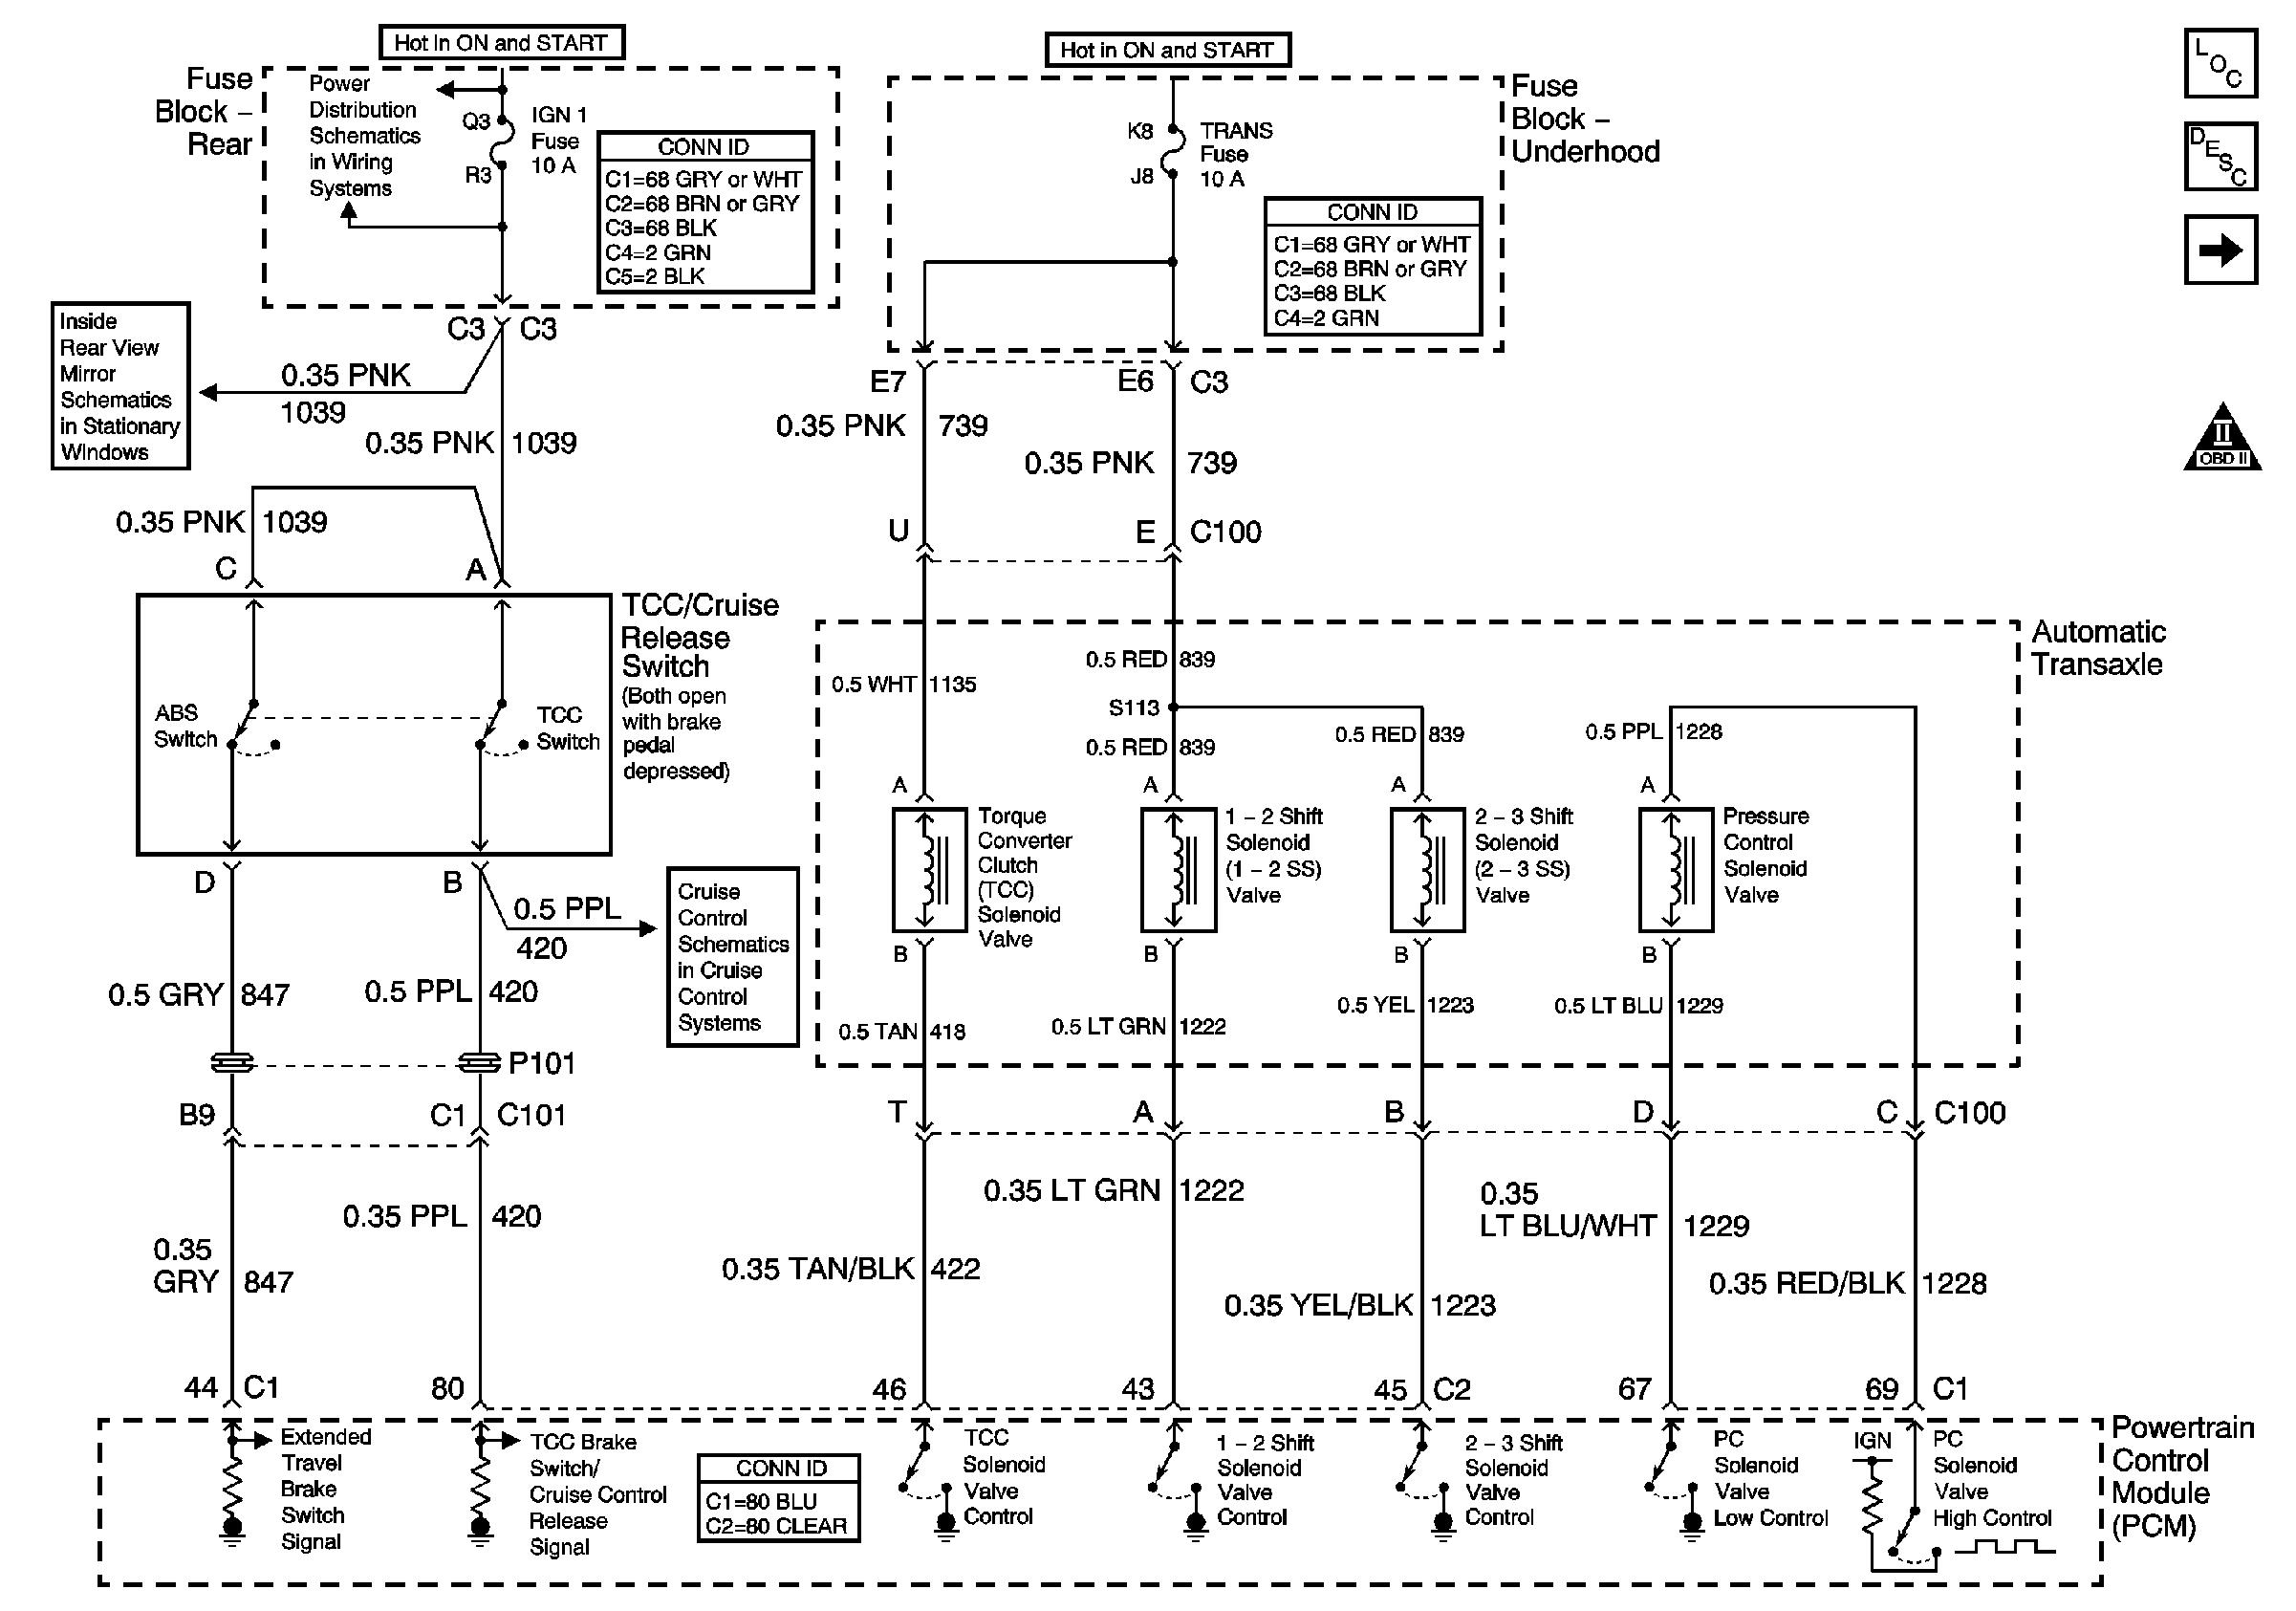 Wiring Schematics For 2001 Cadillac Escalade Wiring Diagram Resource Resource Led Illumina It